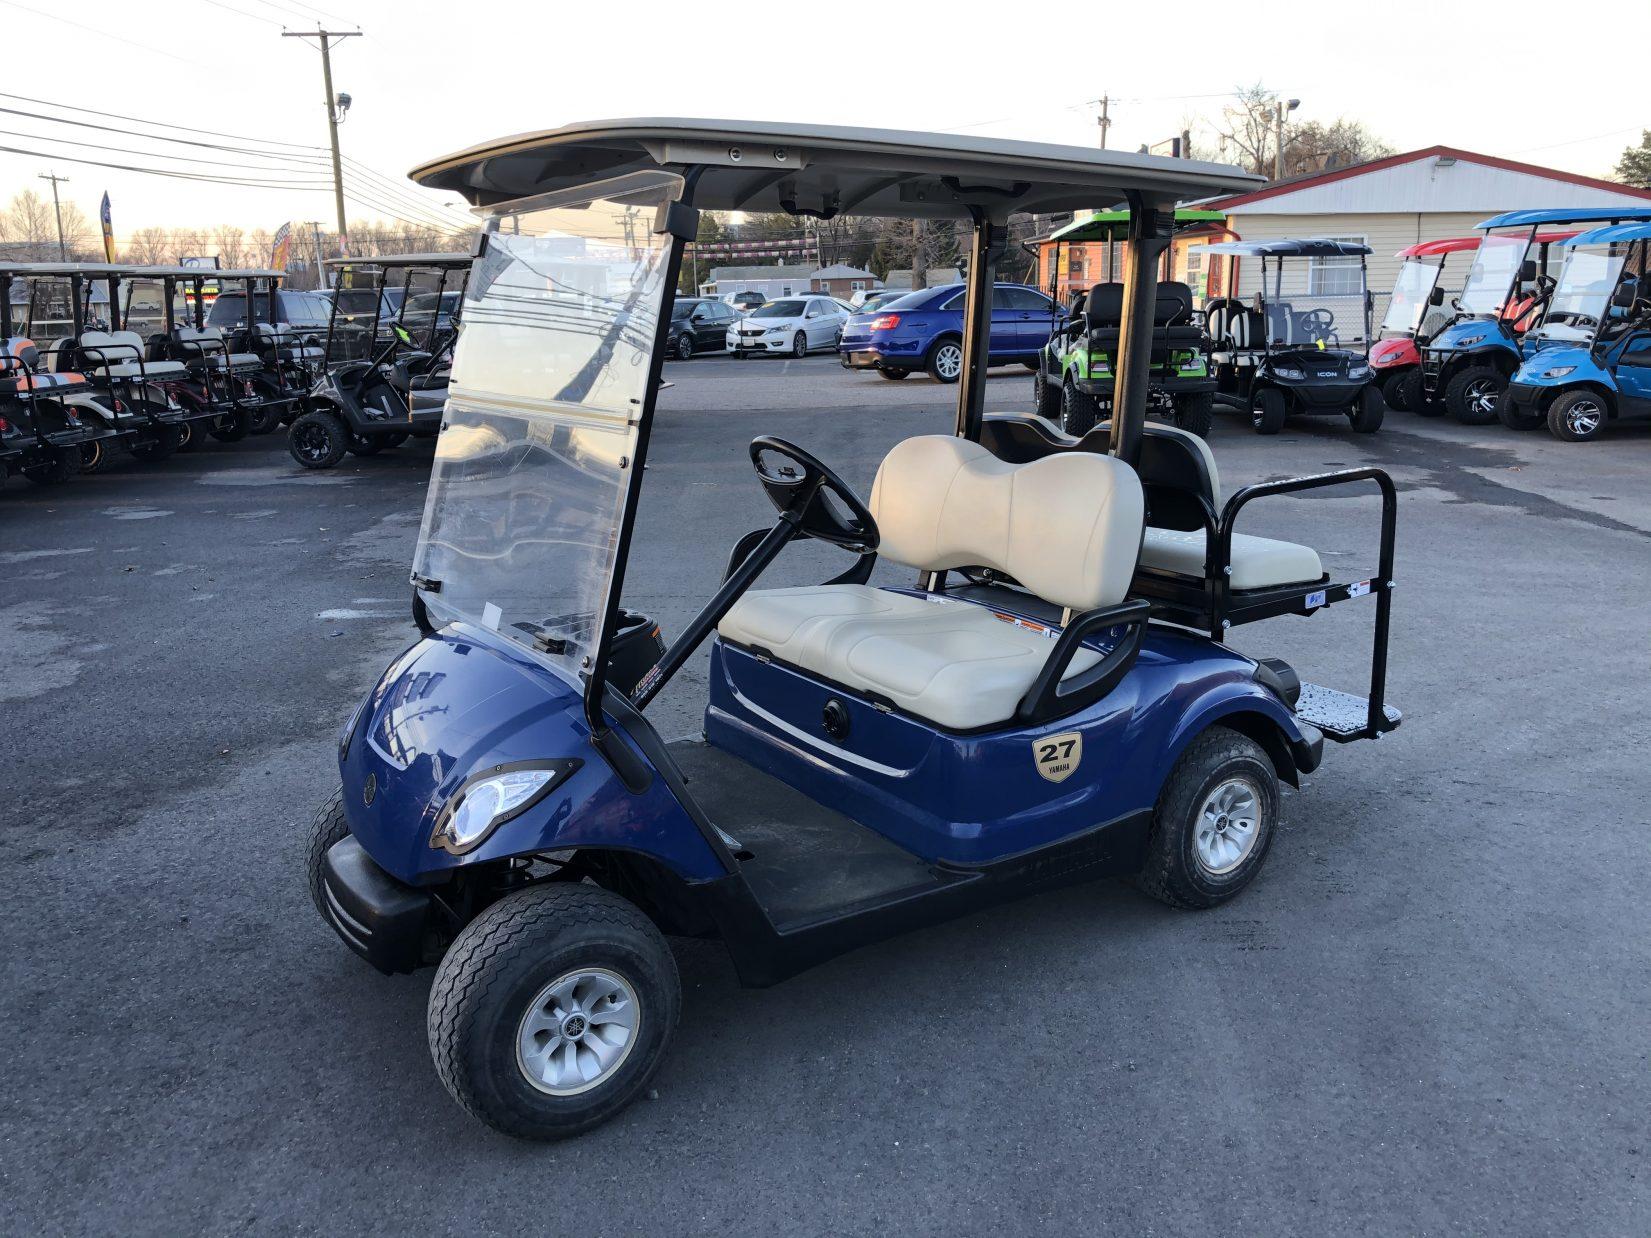 2016 Yamaha 48 volt electric golf cart Blue, 4 seat, LED ...